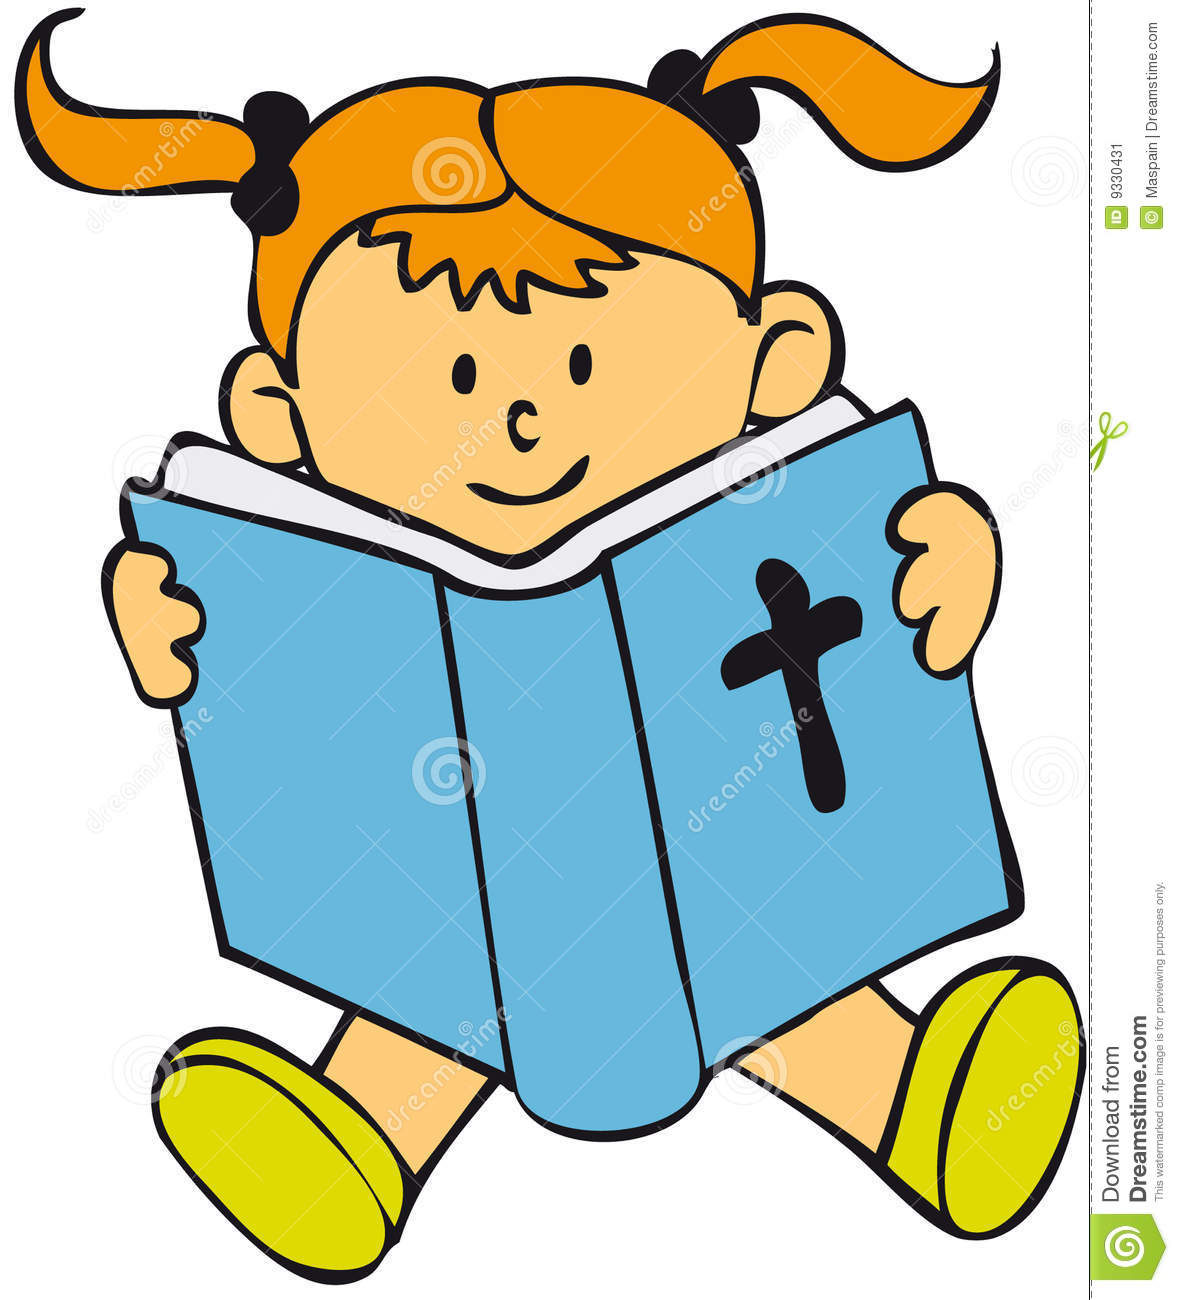 1179x1300 Bible Cartoon Christian Clipart Picture